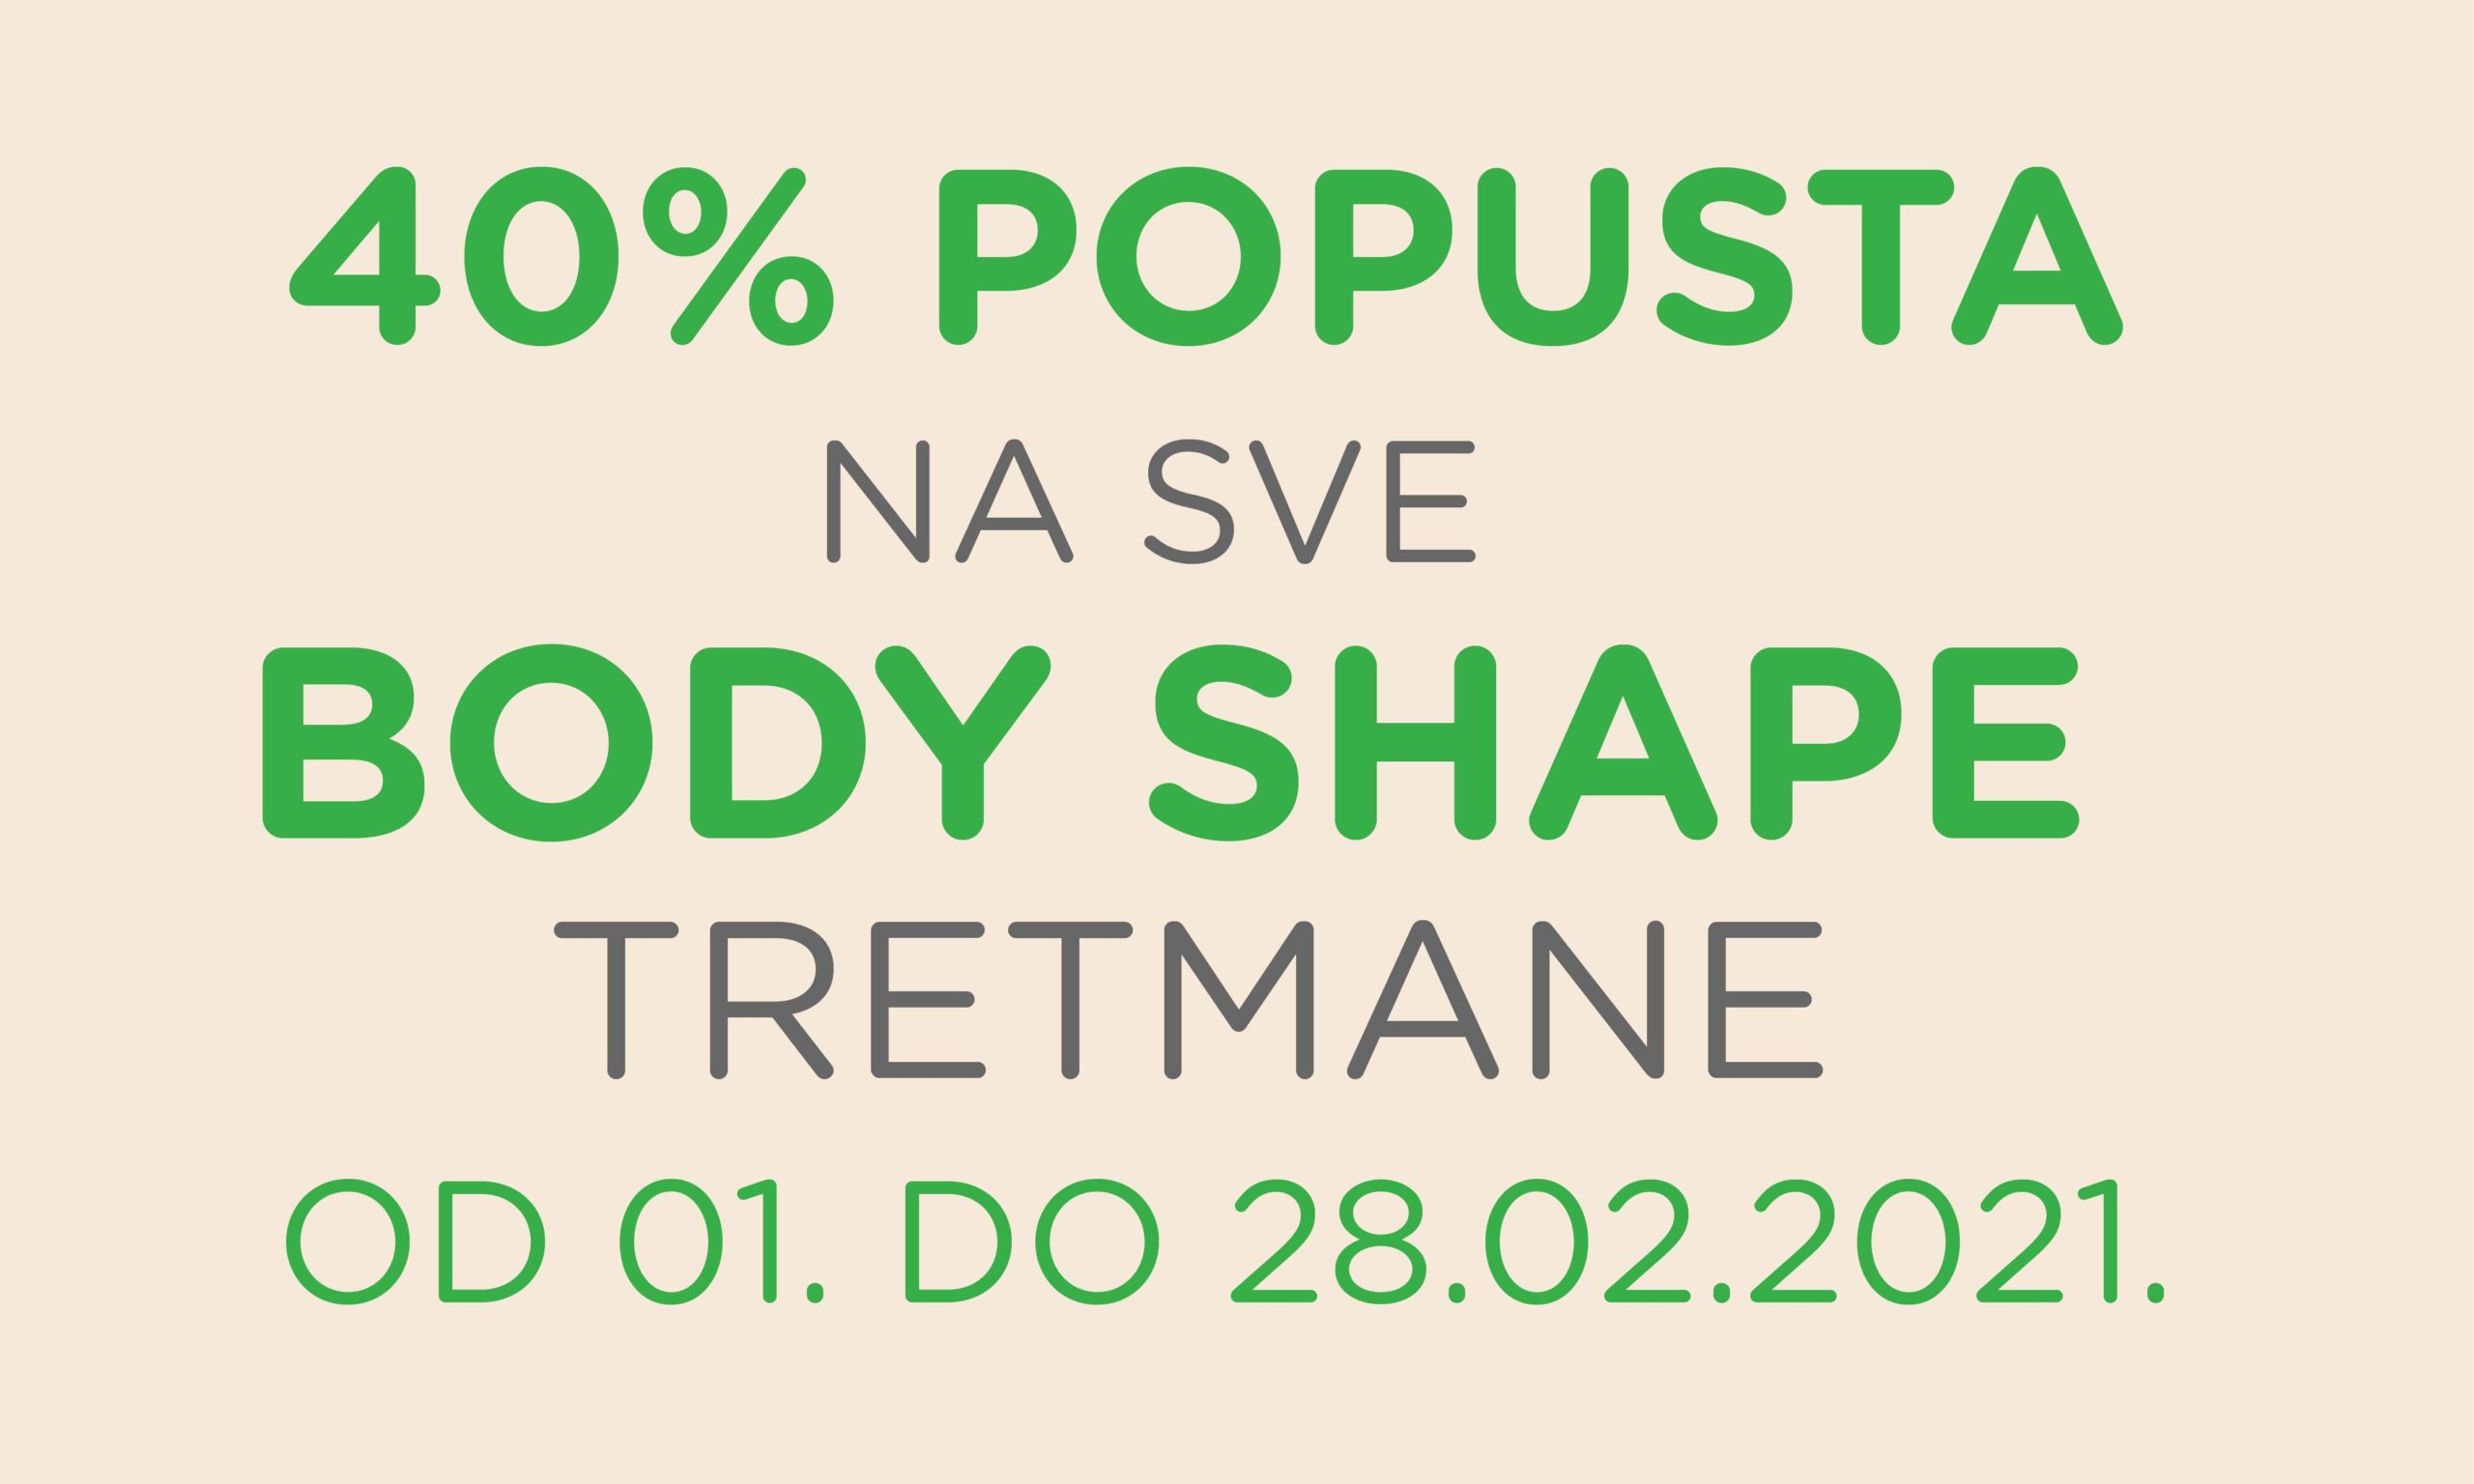 30% popusta